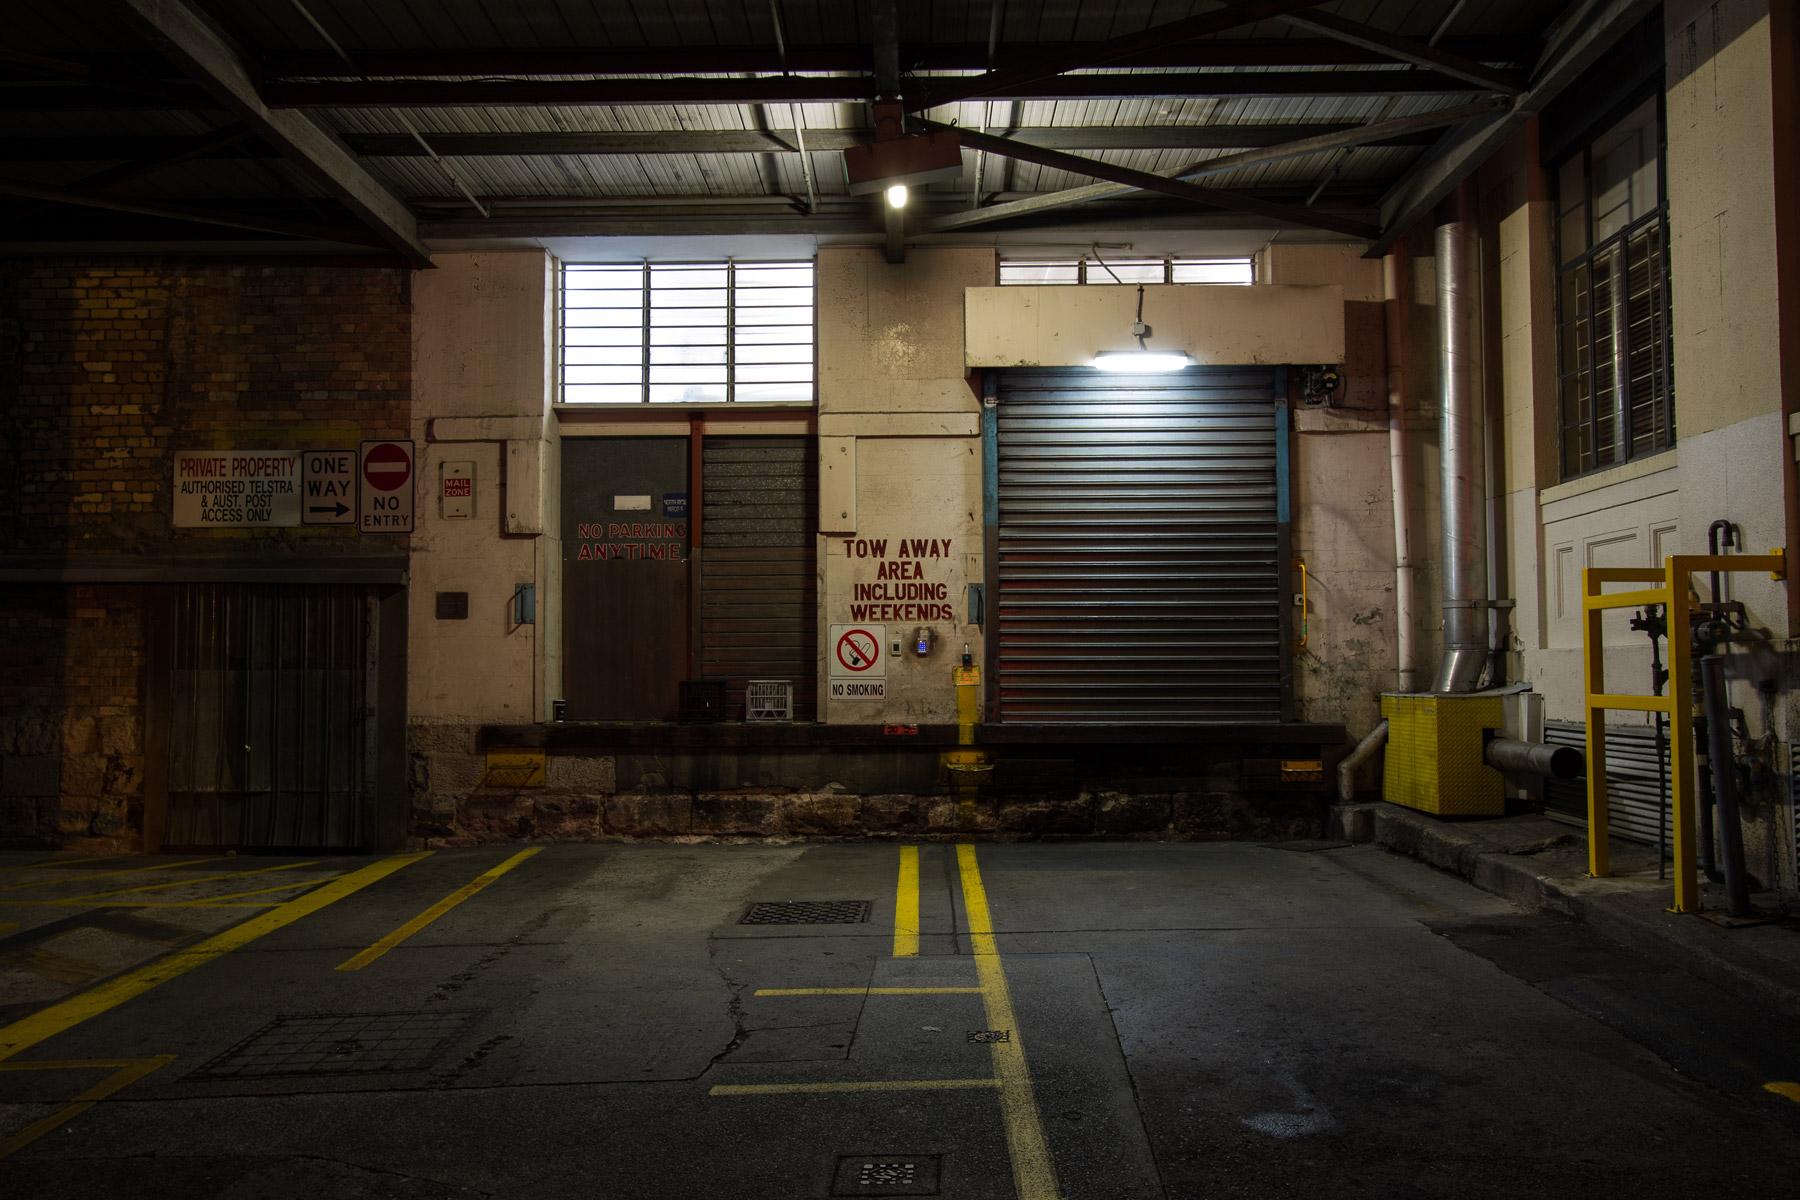 A loading dock in the Brisbane CBD at night